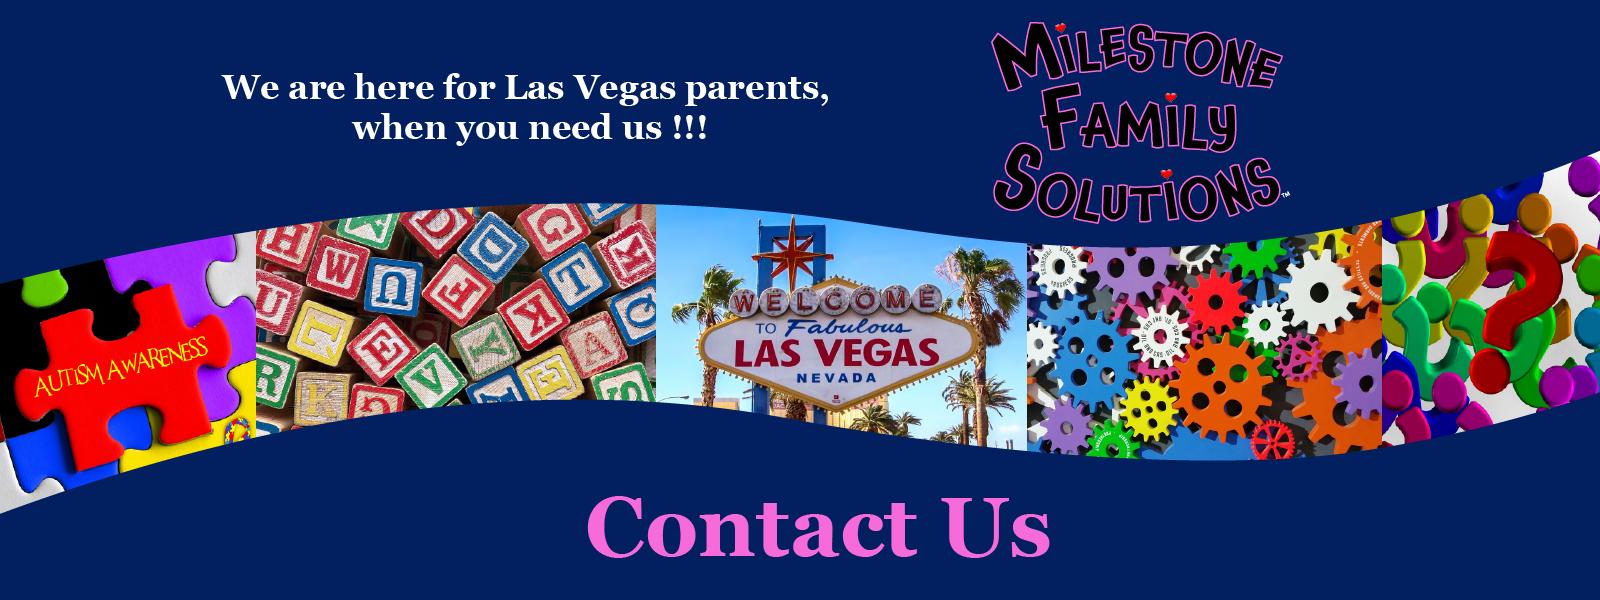 contact us header